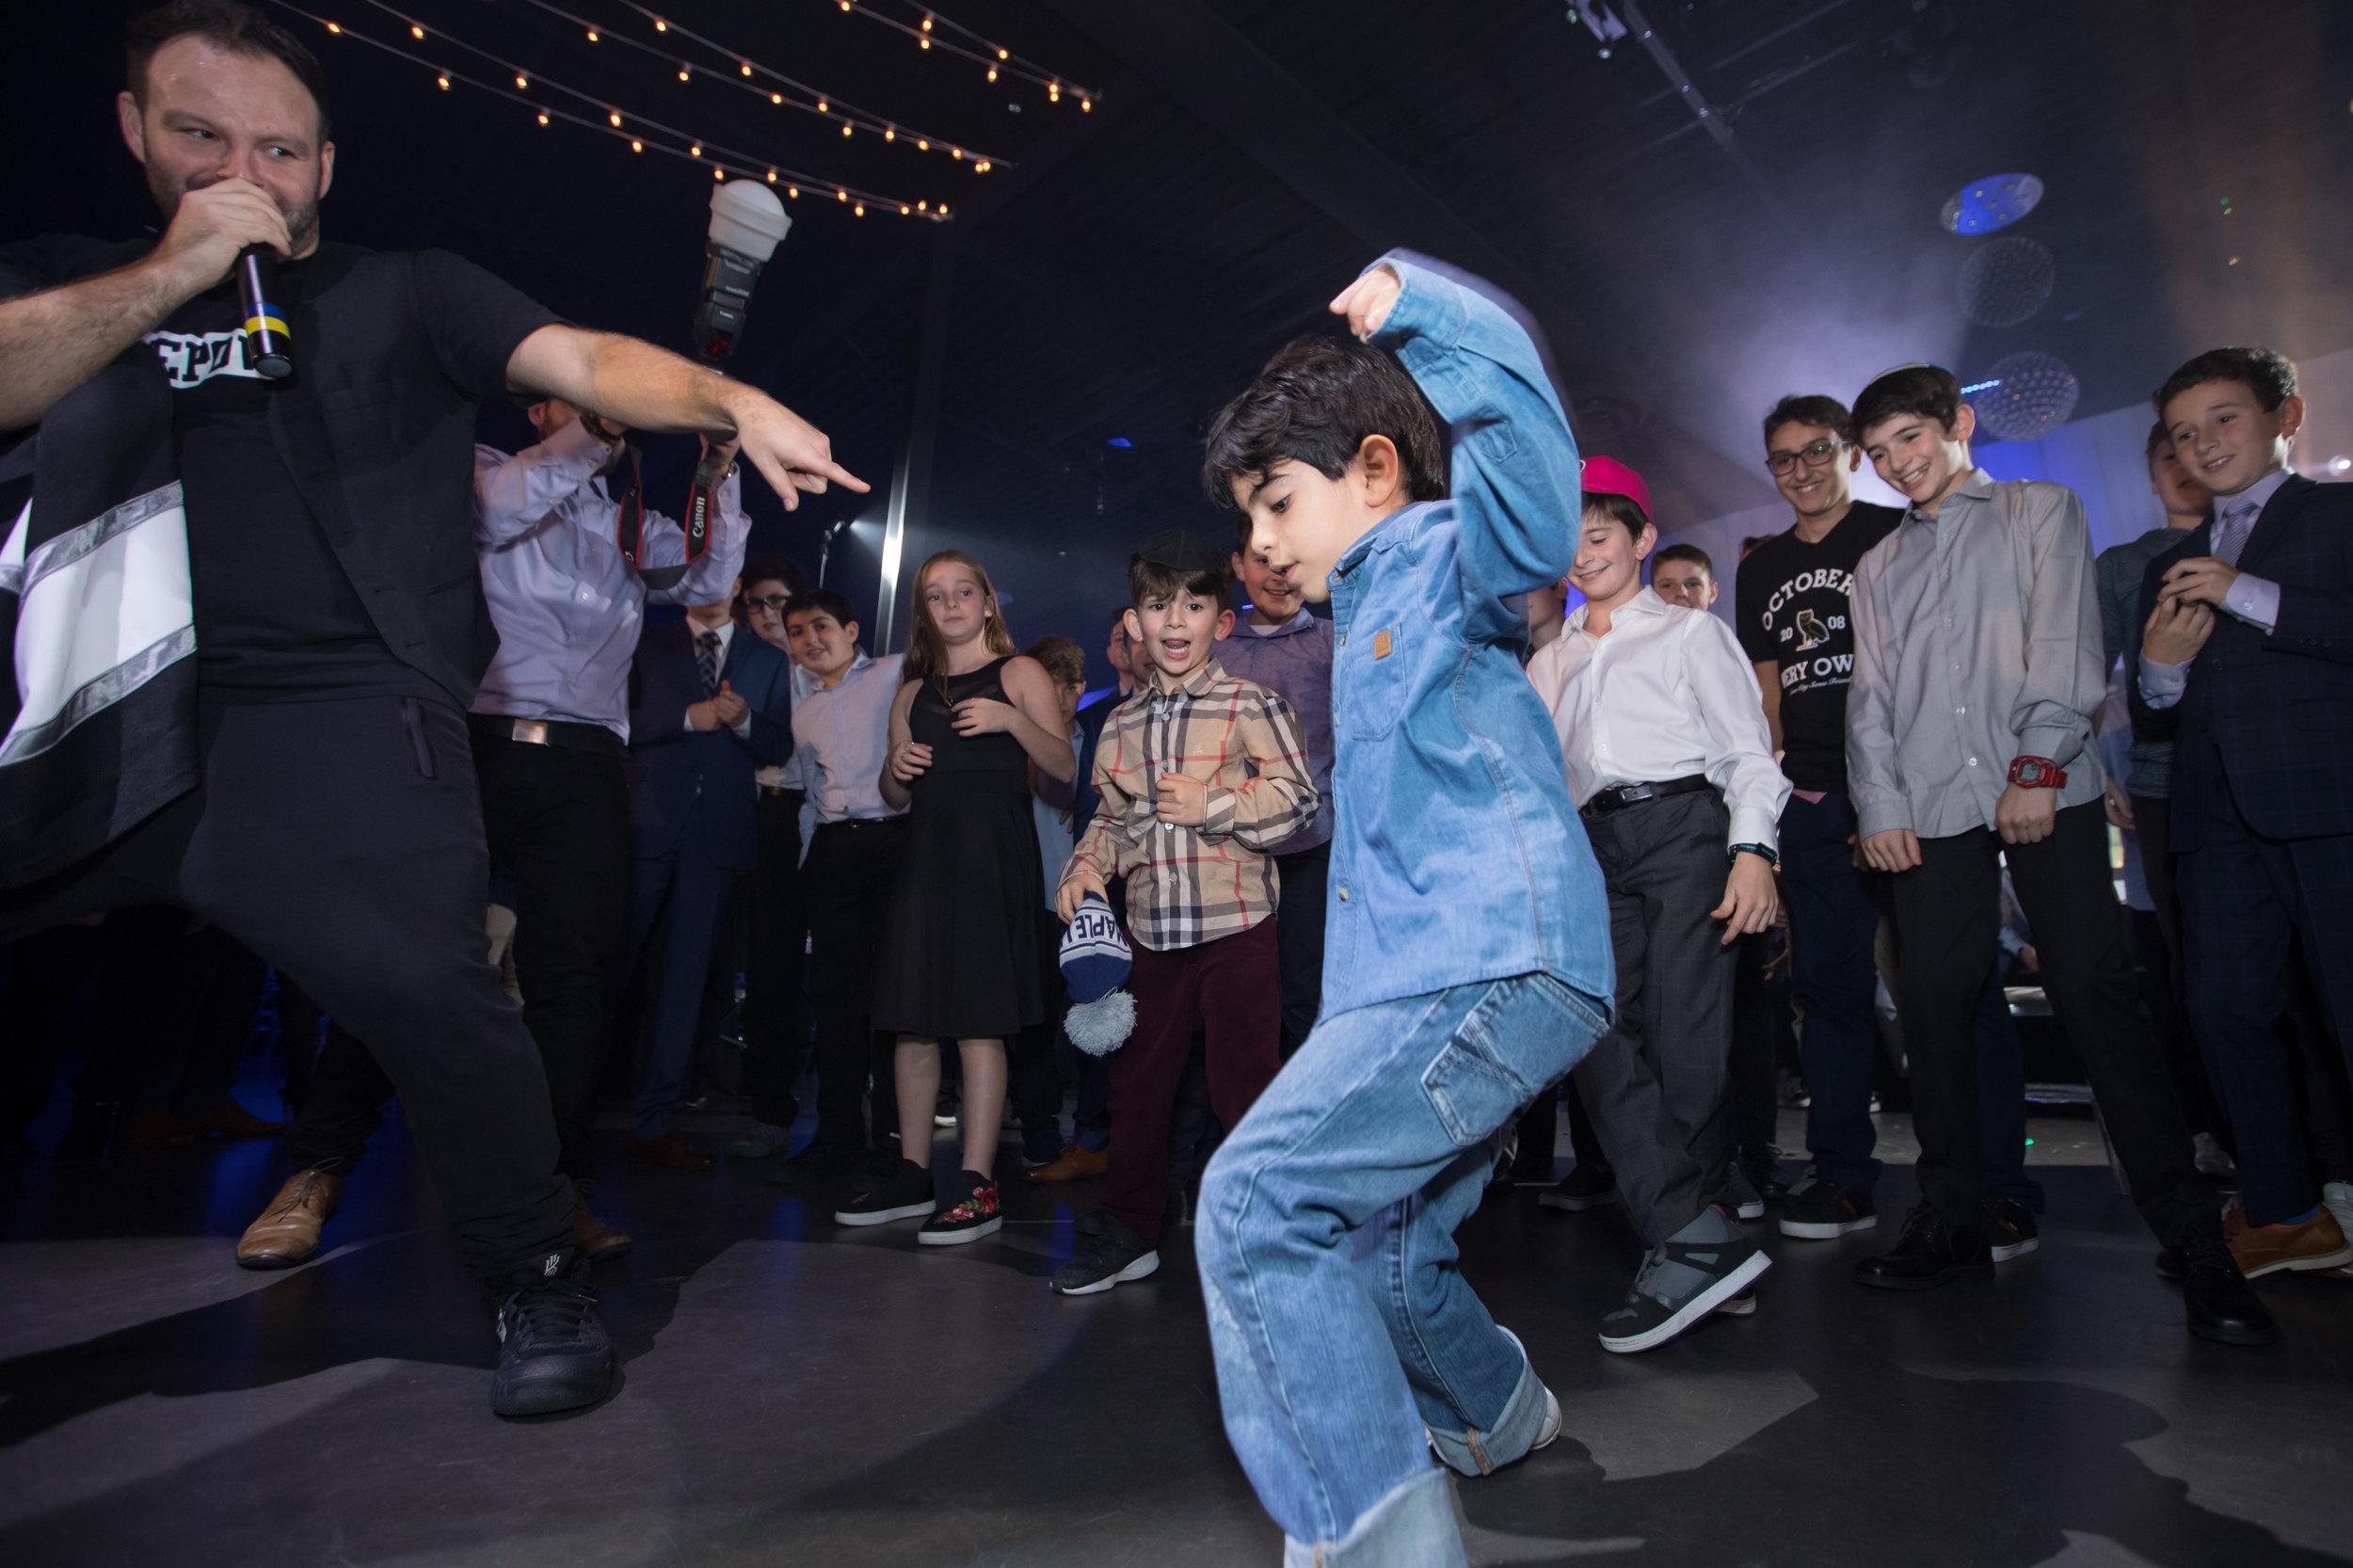 Daniel-Party-0709.jpg